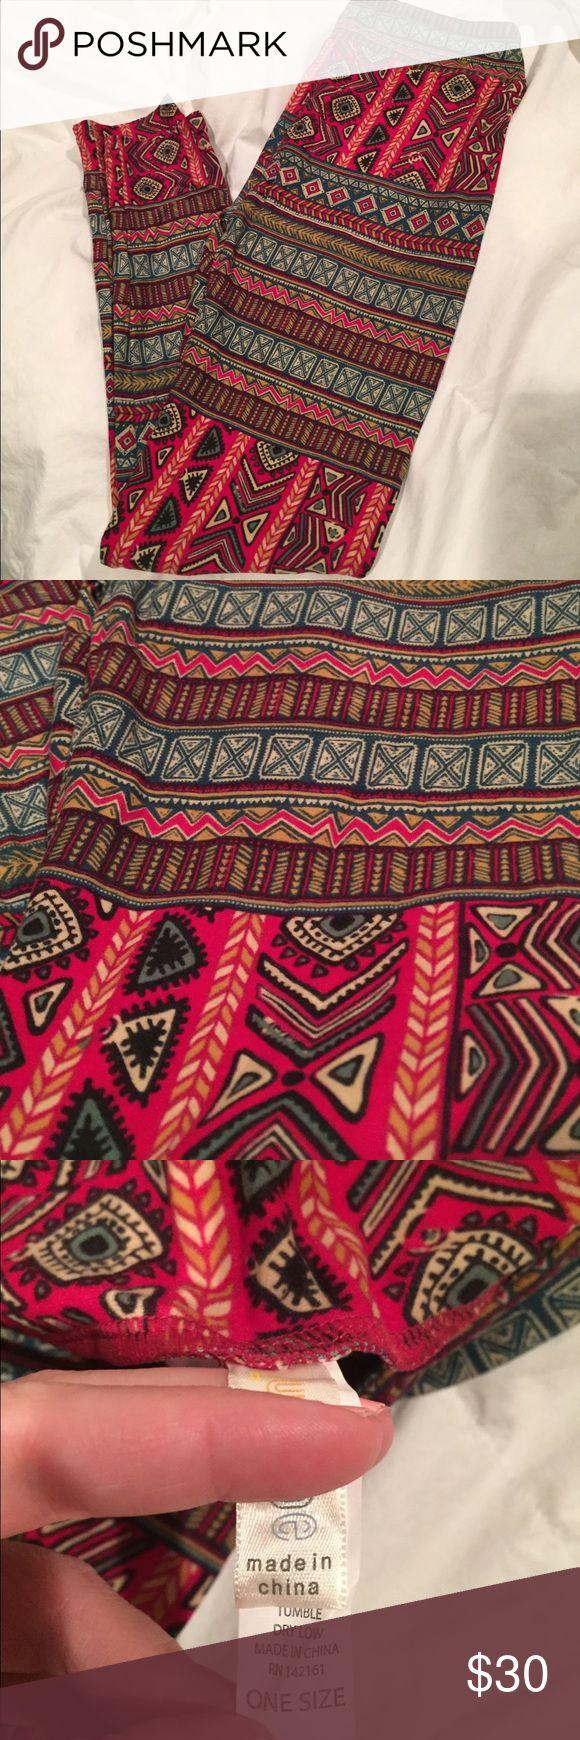 NWOT LuLaRoe OS Aztec Print Legging New worn tags. Never worn. Originally paid $25 plus shipping. LuLaRoe Pants Leggings